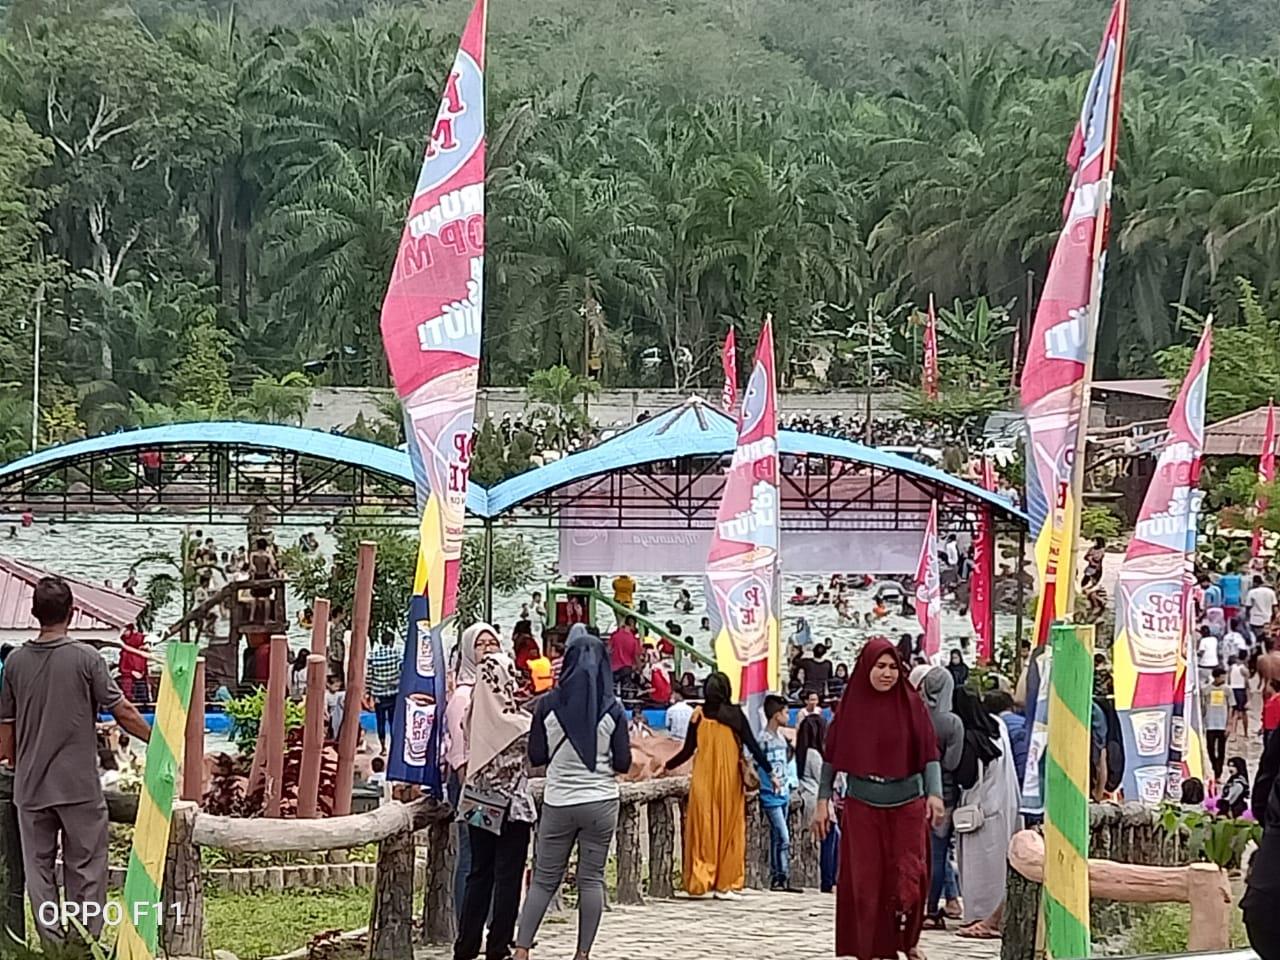 Wisata Alam Pasuruan Jaya, Tiket Murah Meriah